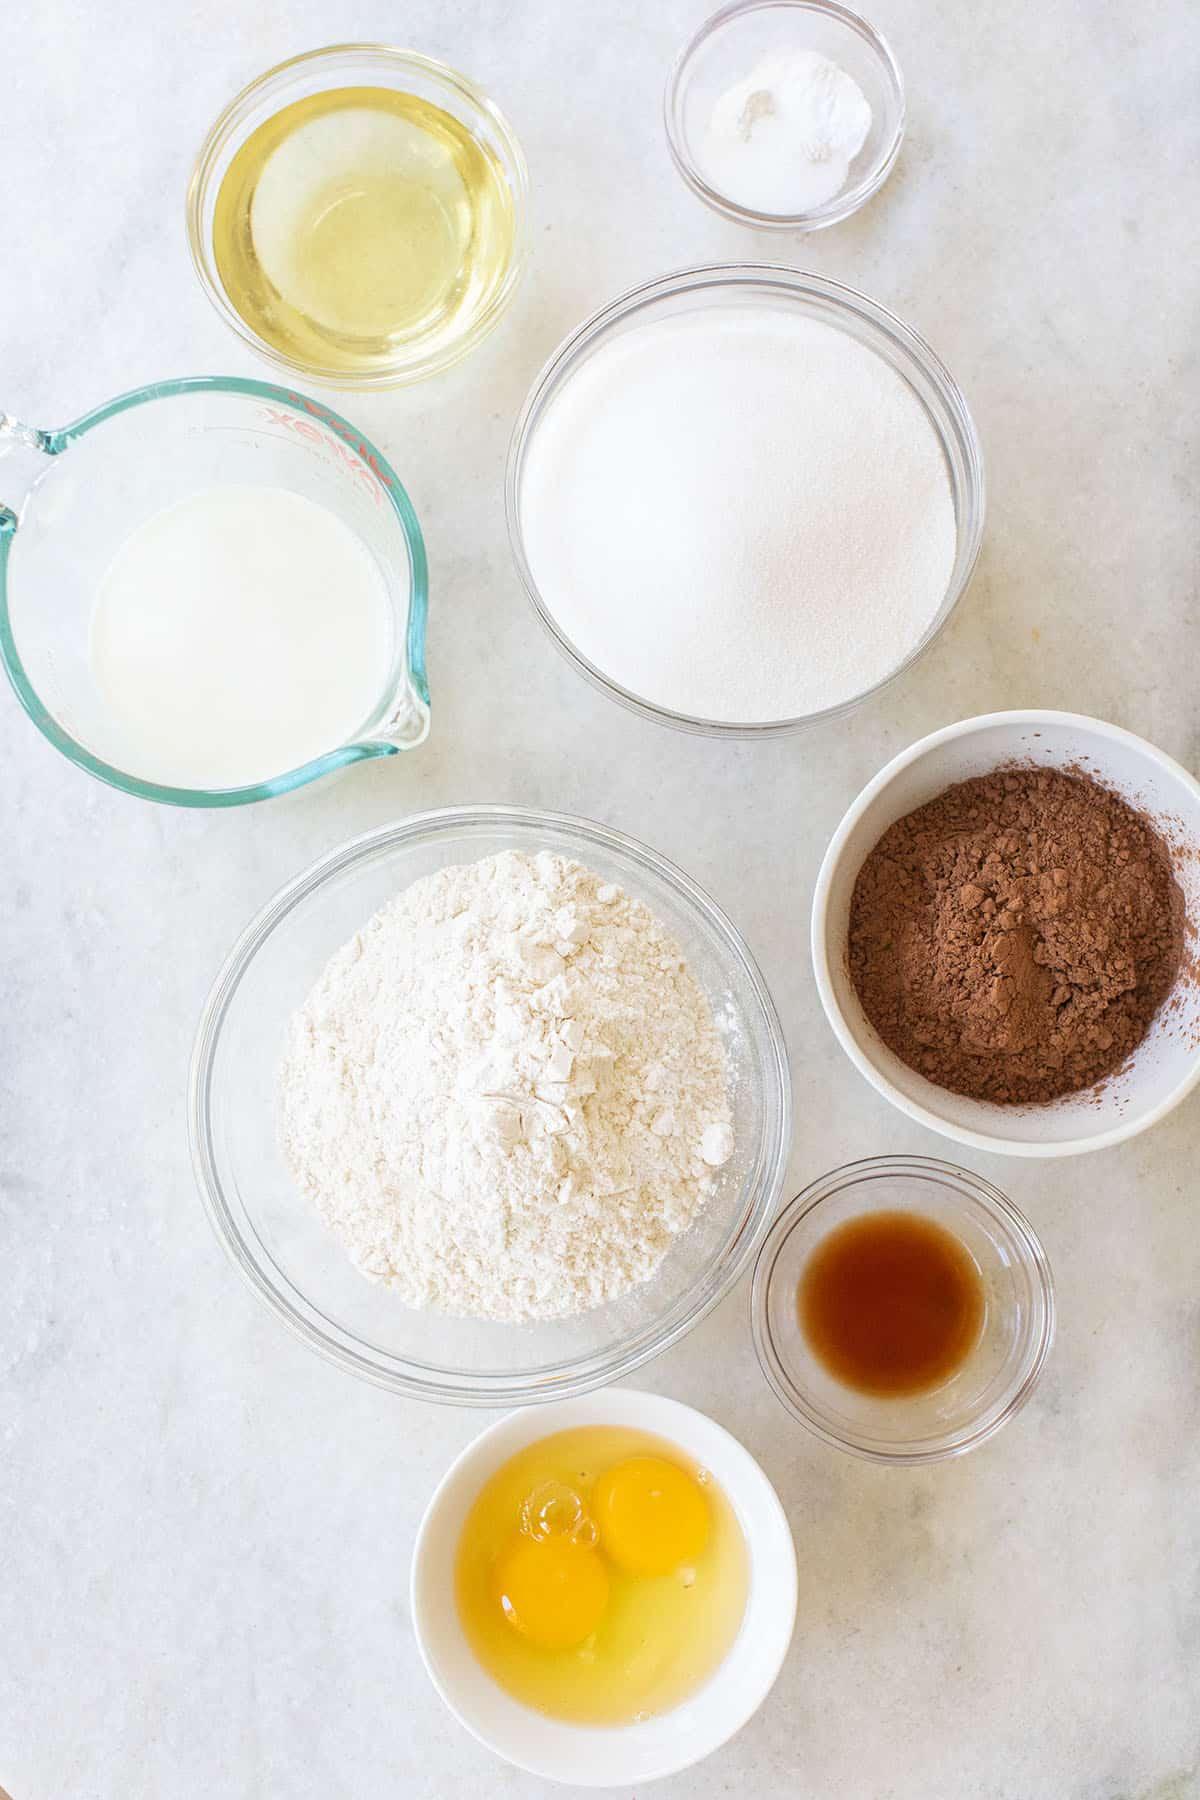 oil, flour, sugar, cocoa powder, eggs, milk, vanilla extract and baking soda and baking powder in small bowls